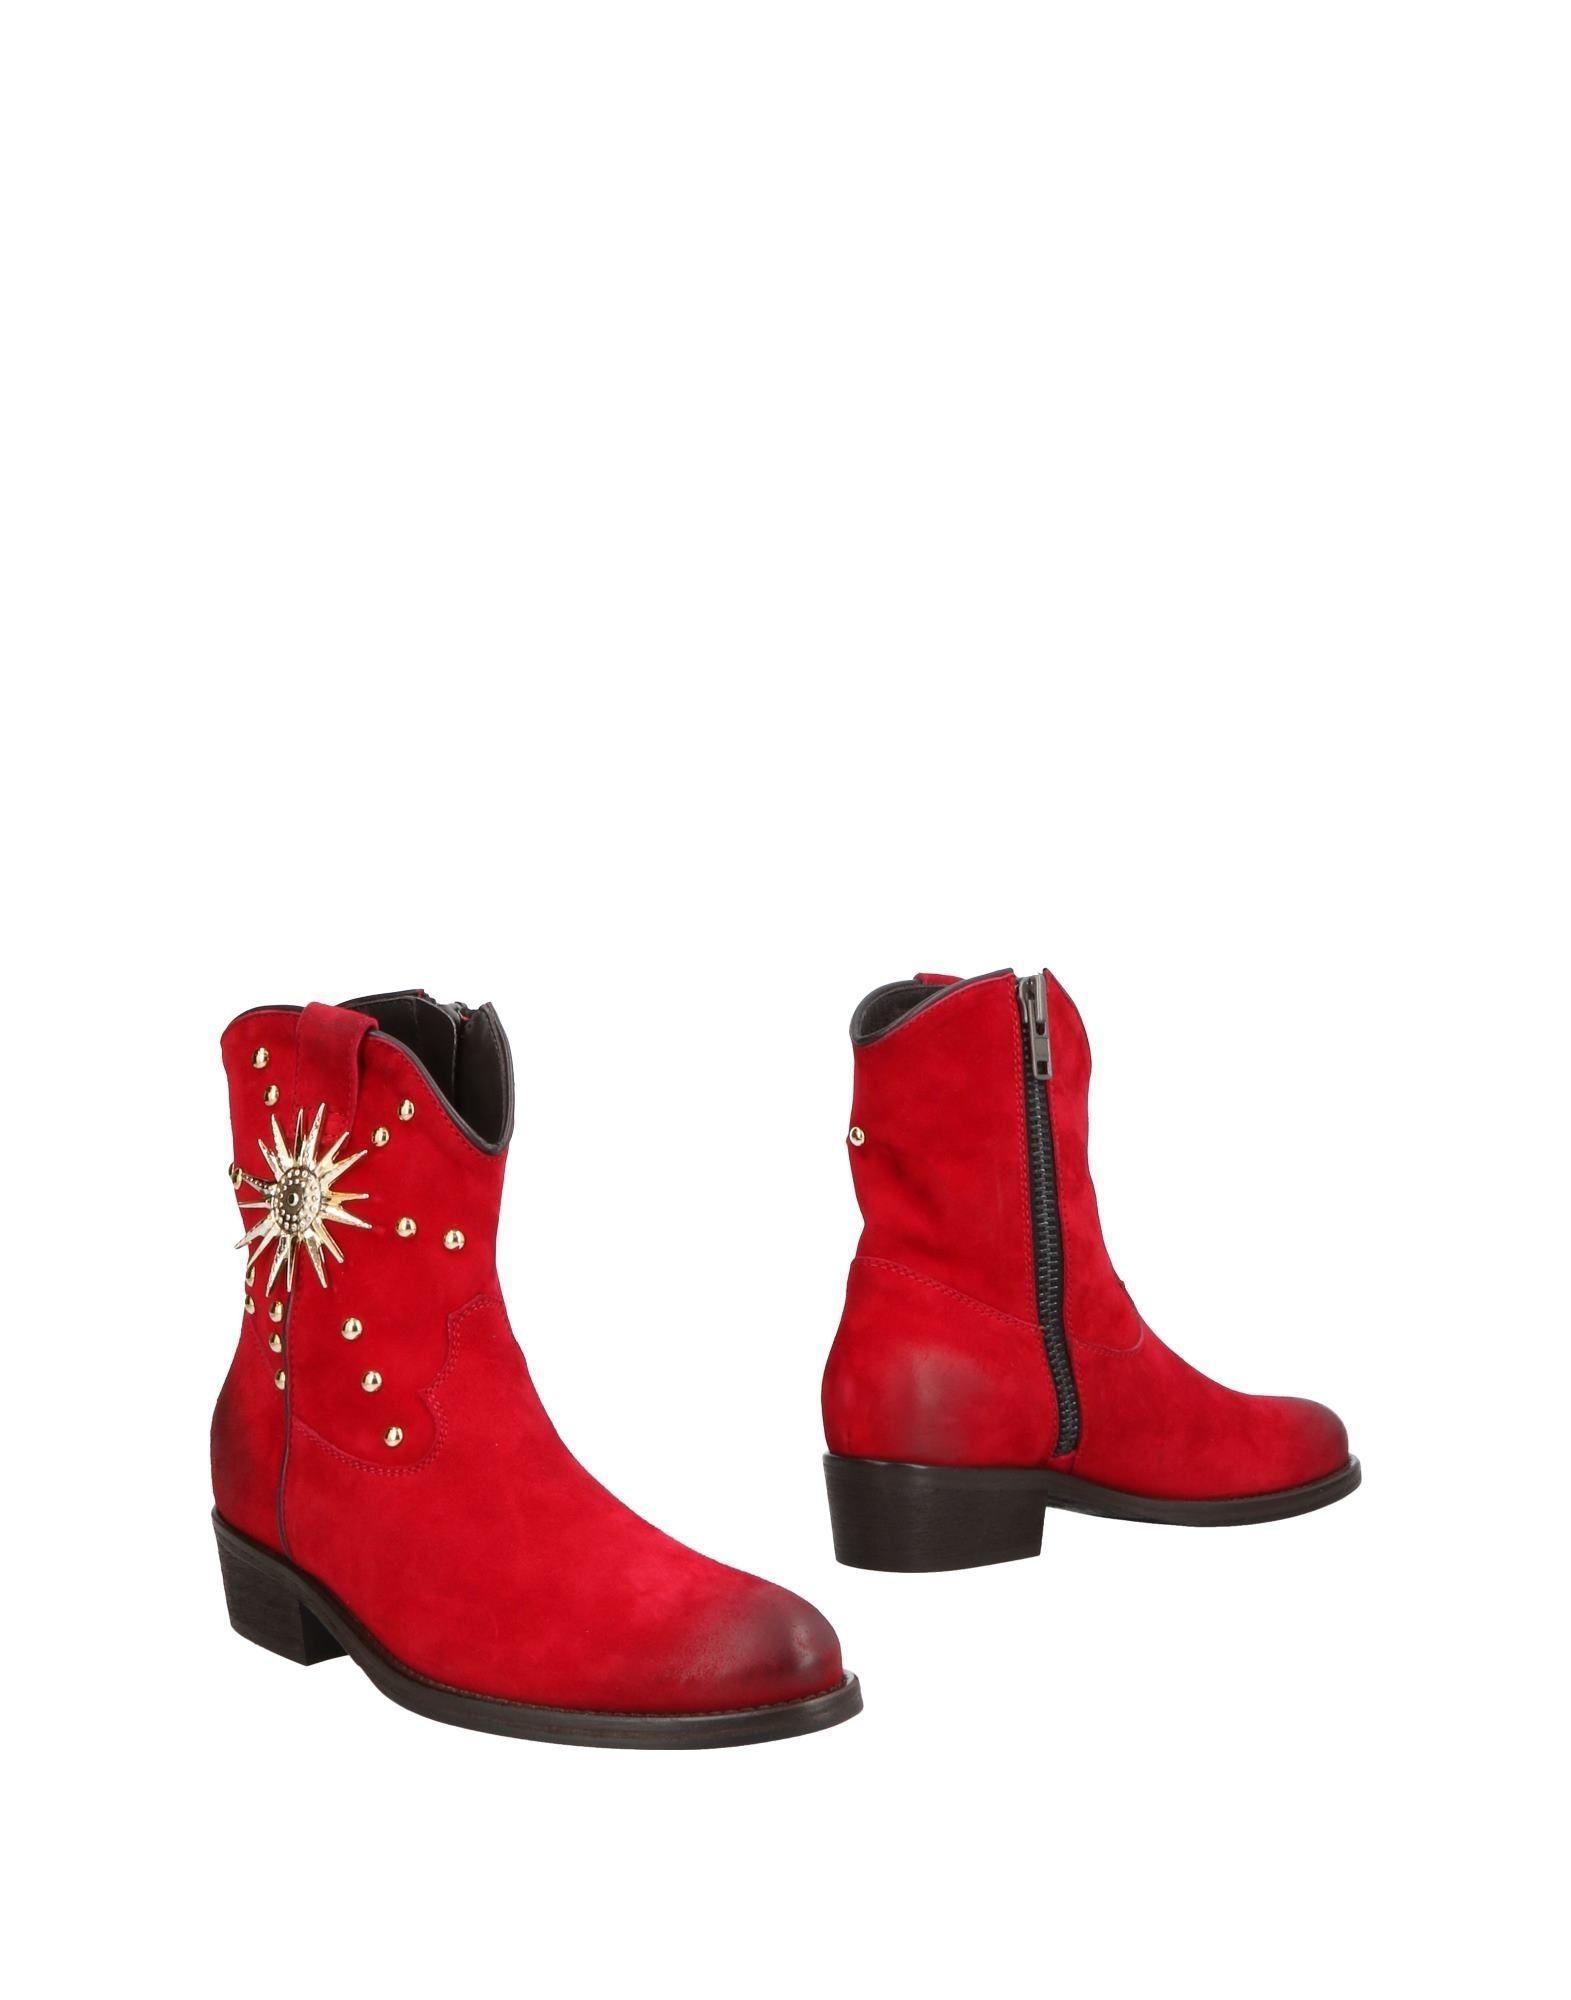 Via Roma 15 Stiefelette Damen  11503421OHGut aussehende strapazierfähige Schuhe